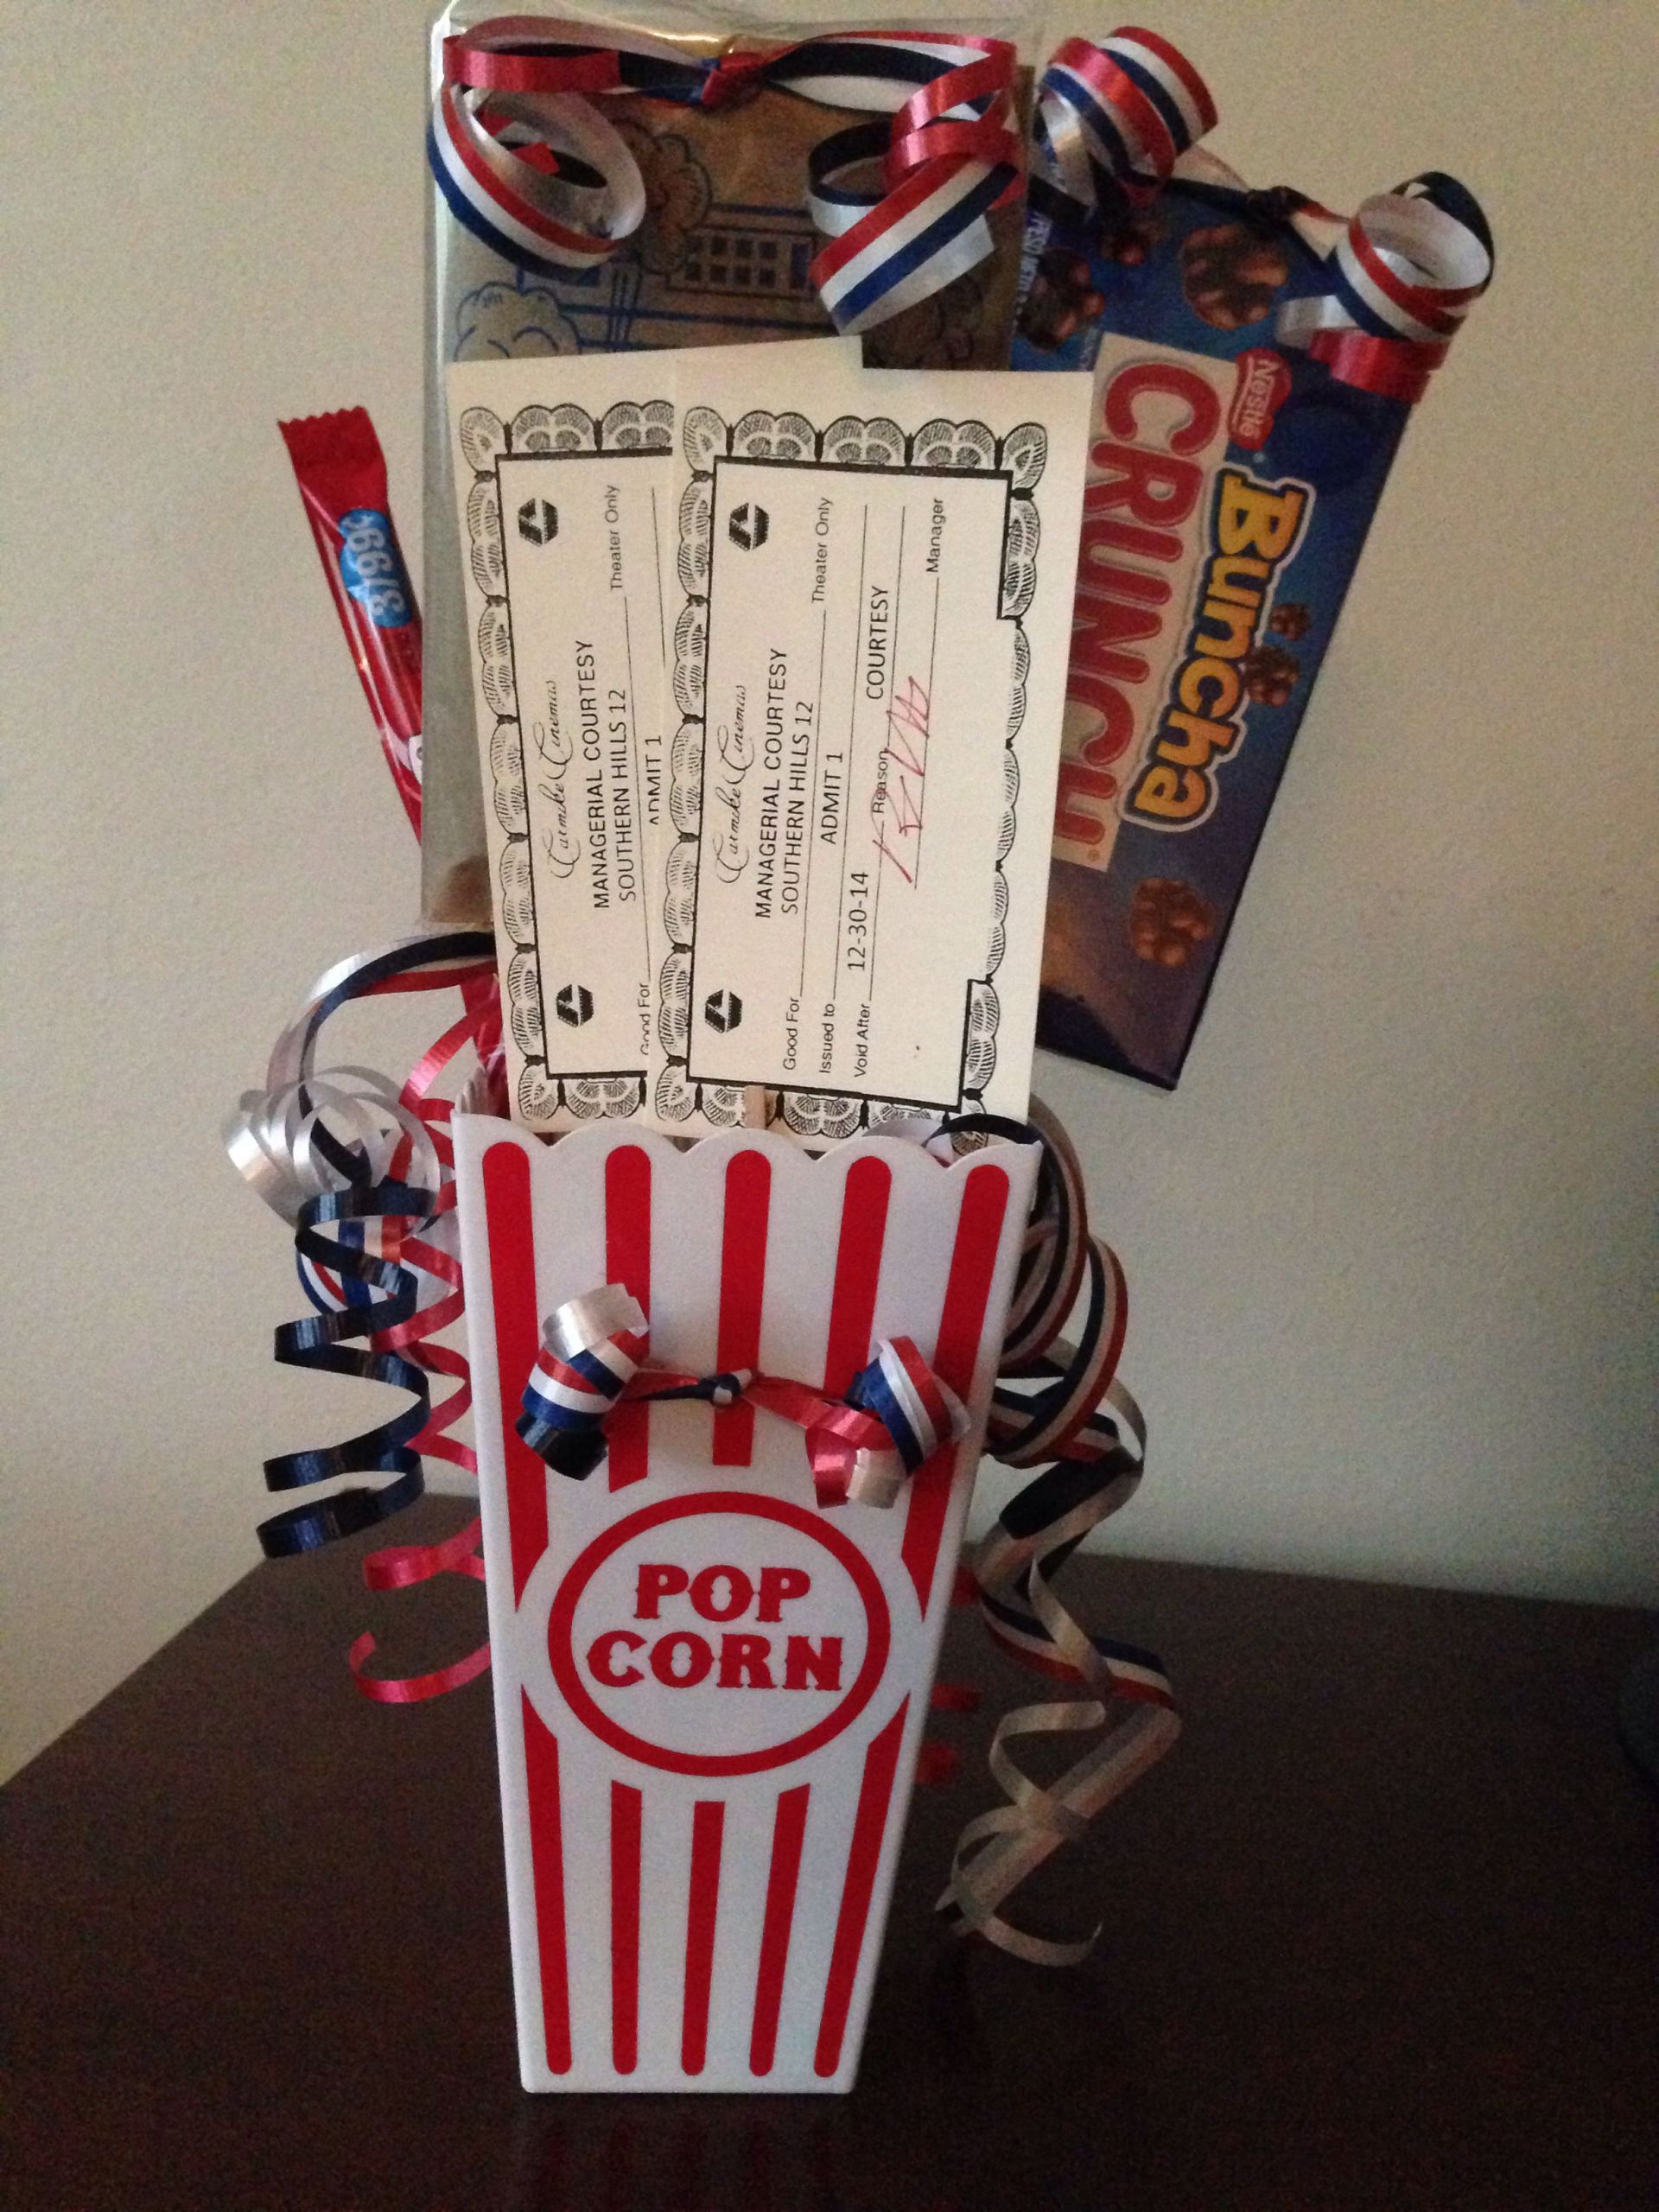 5Th Grade Graduation Gift Ideas For Boys  5th Grade Graduation t basket movies